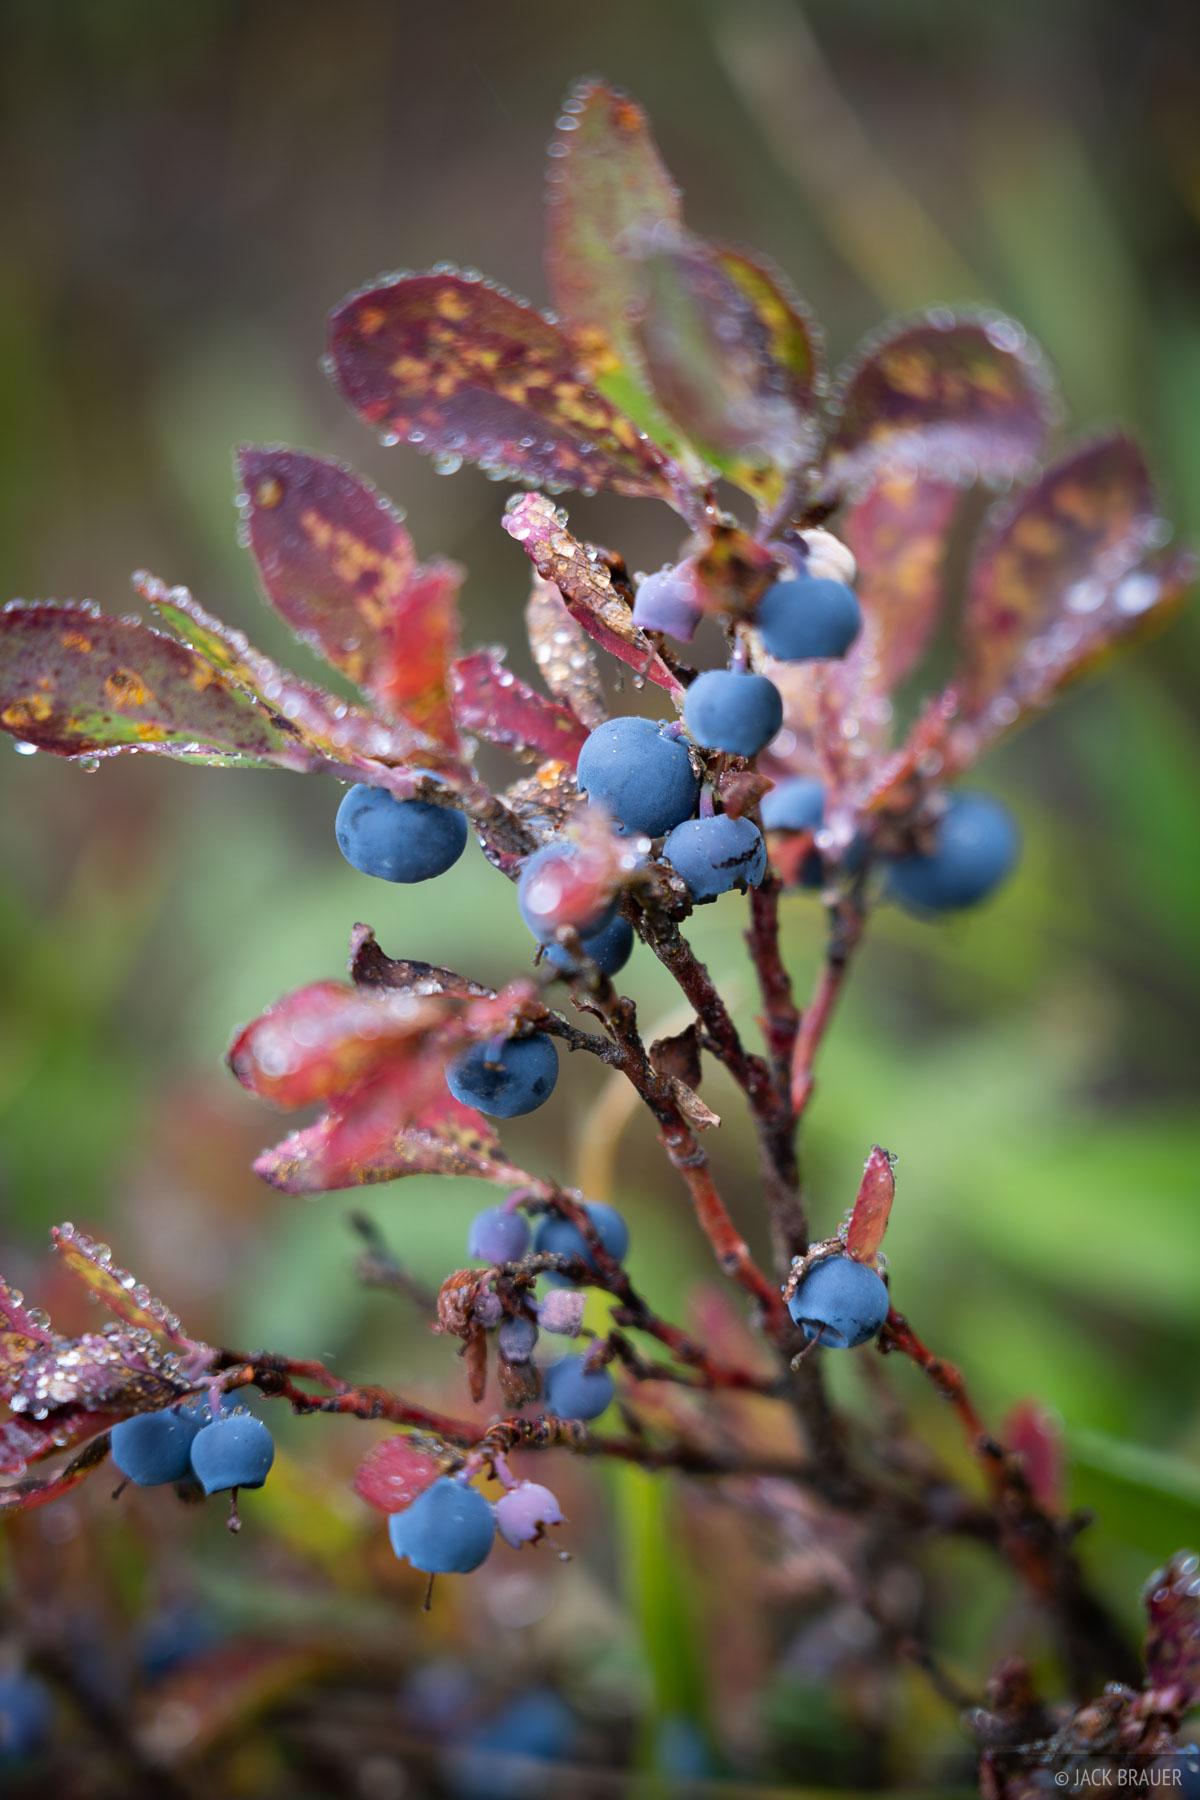 Rain soaked huckleberries in early September.